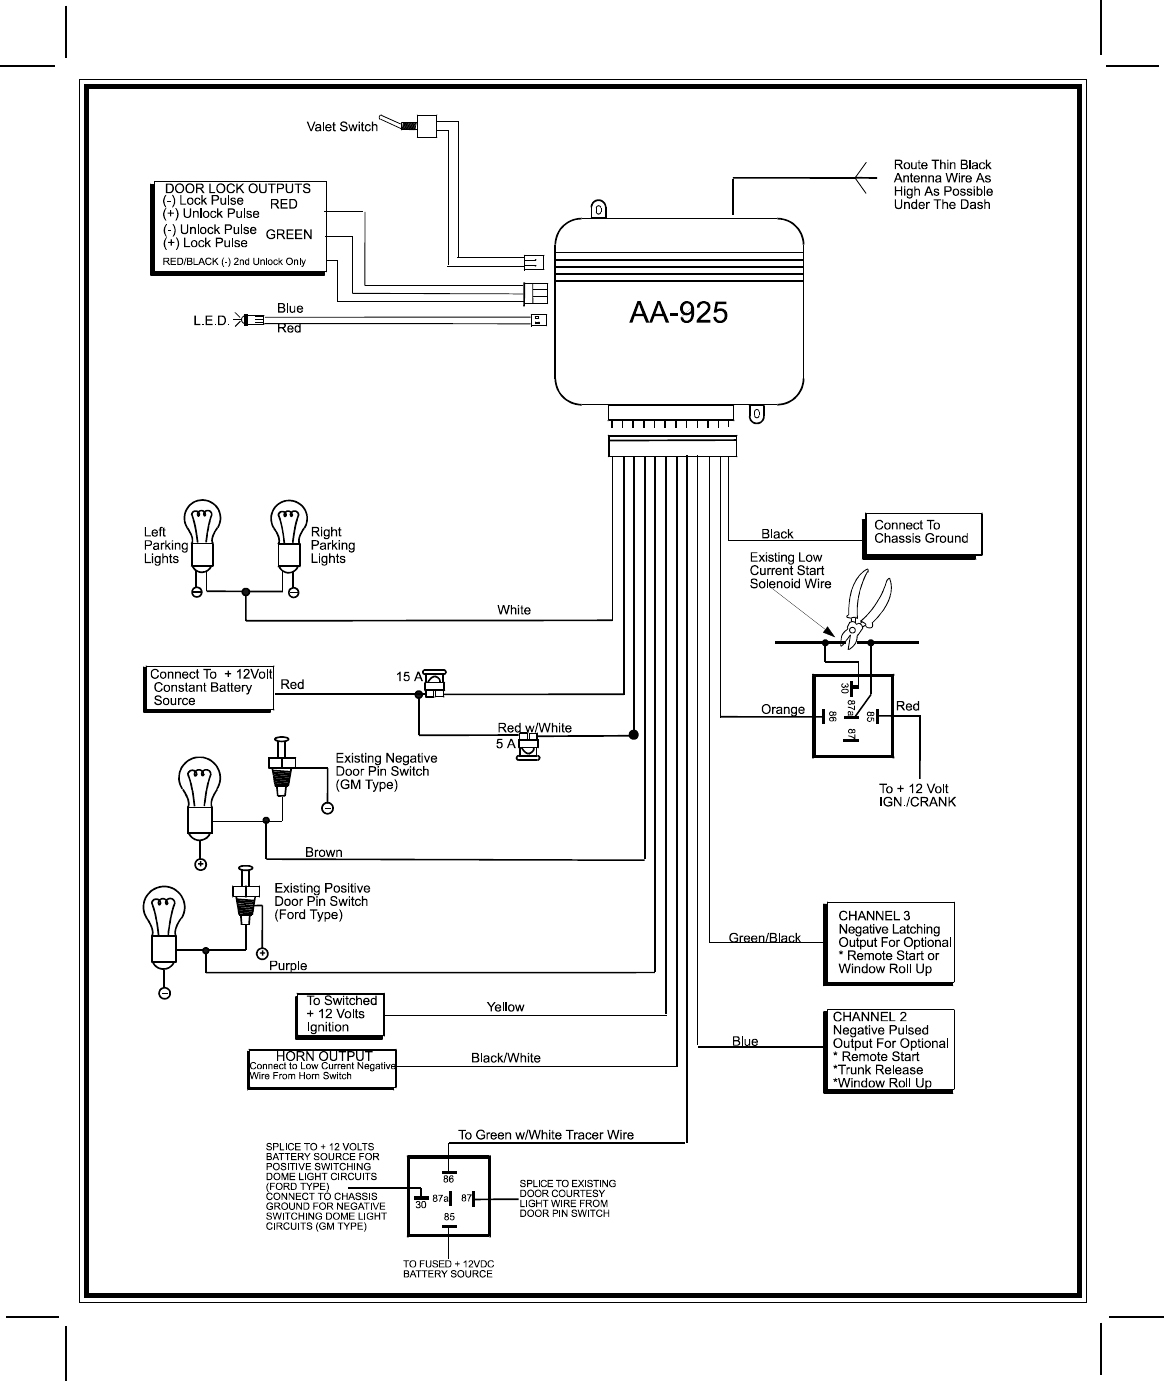 Bulldog Security Rs83B Remote Start Wiring Diagram - Wiring Diagram - Bulldog Wiring Diagram